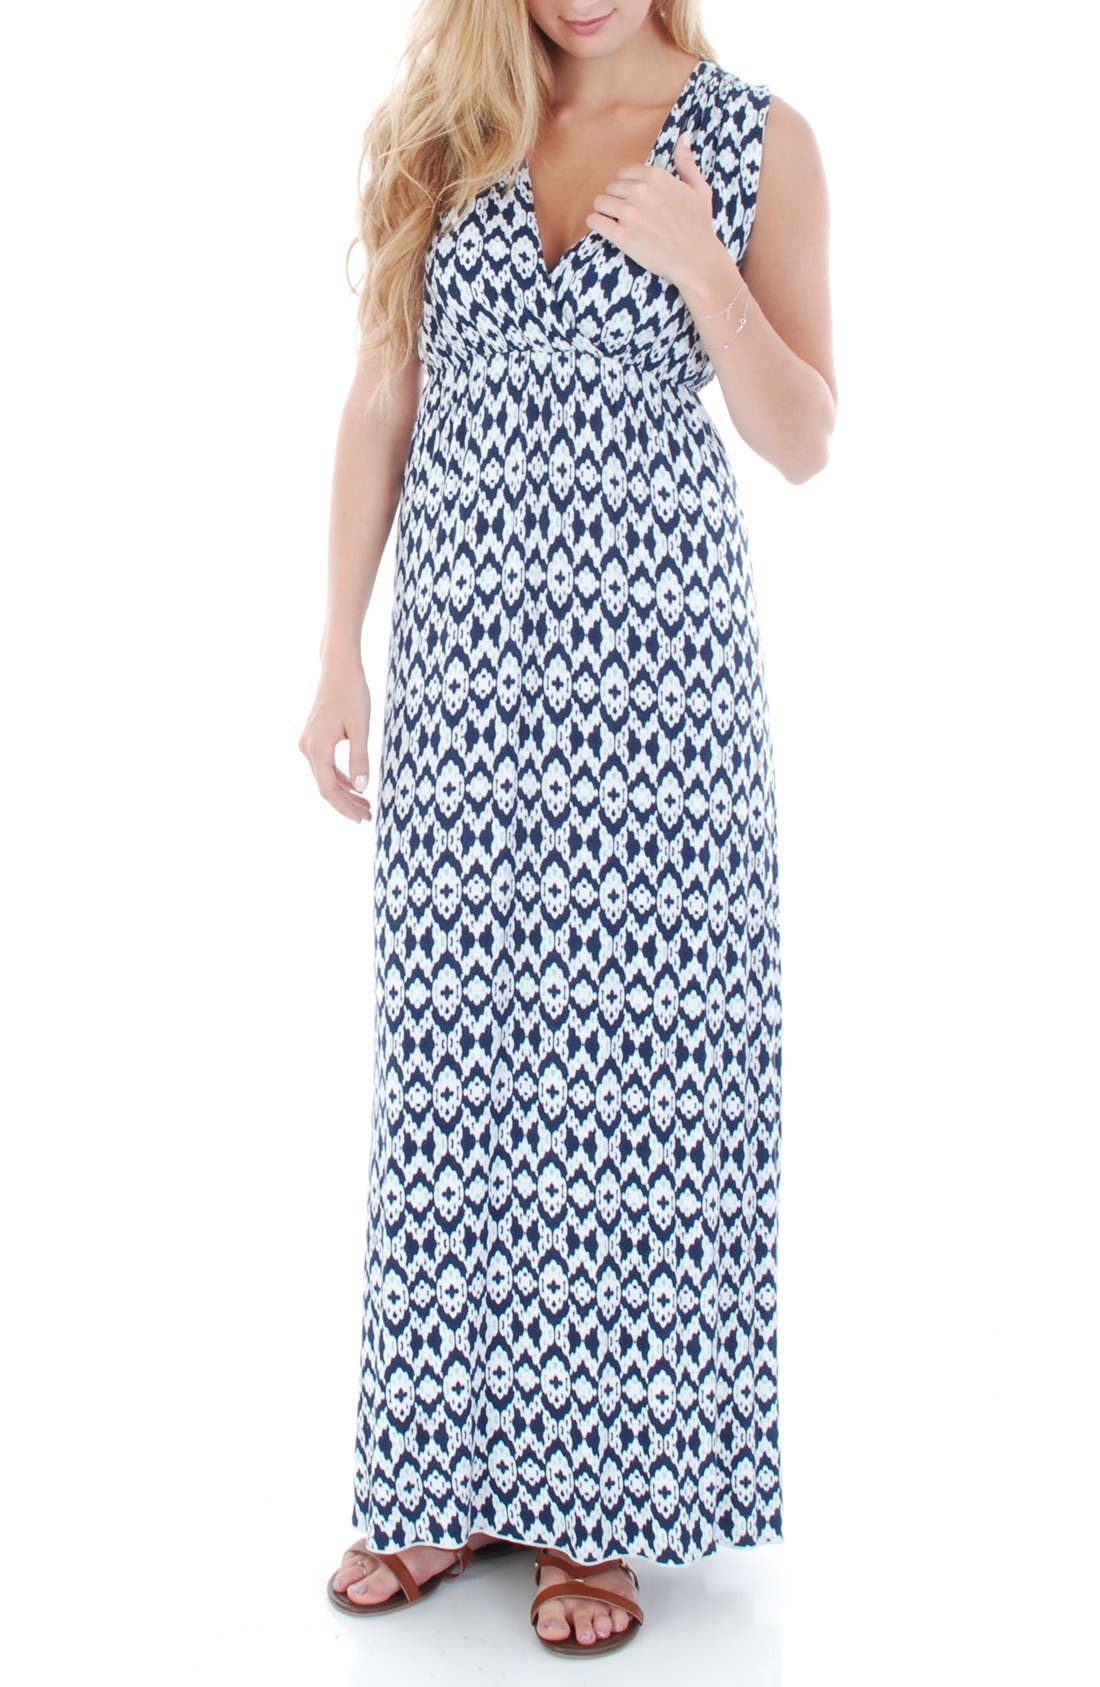 'Jill' Maternity Maxi Dress,                             Alternate thumbnail 3, color,                             400